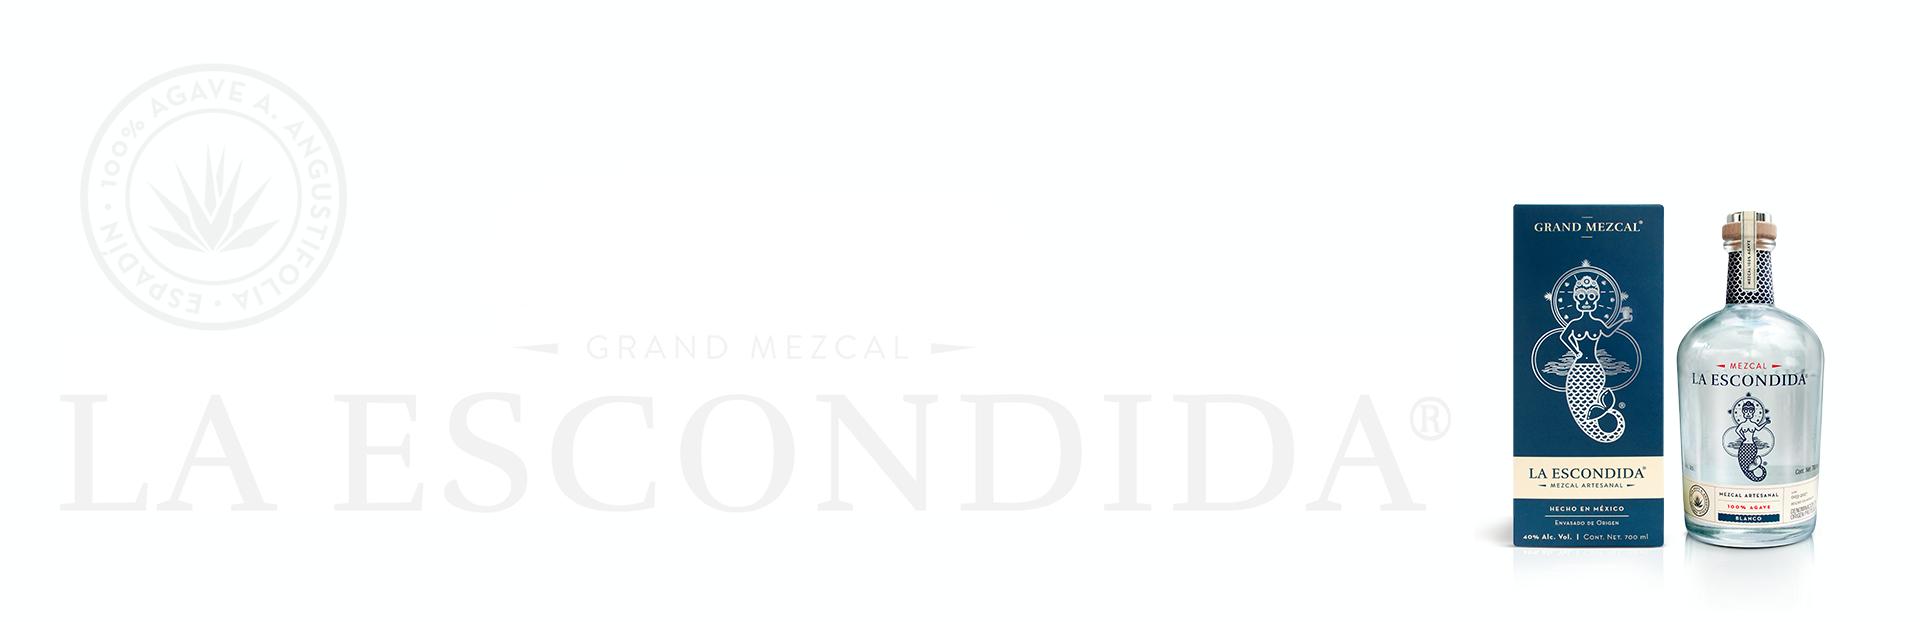 Laescondida_headerv3